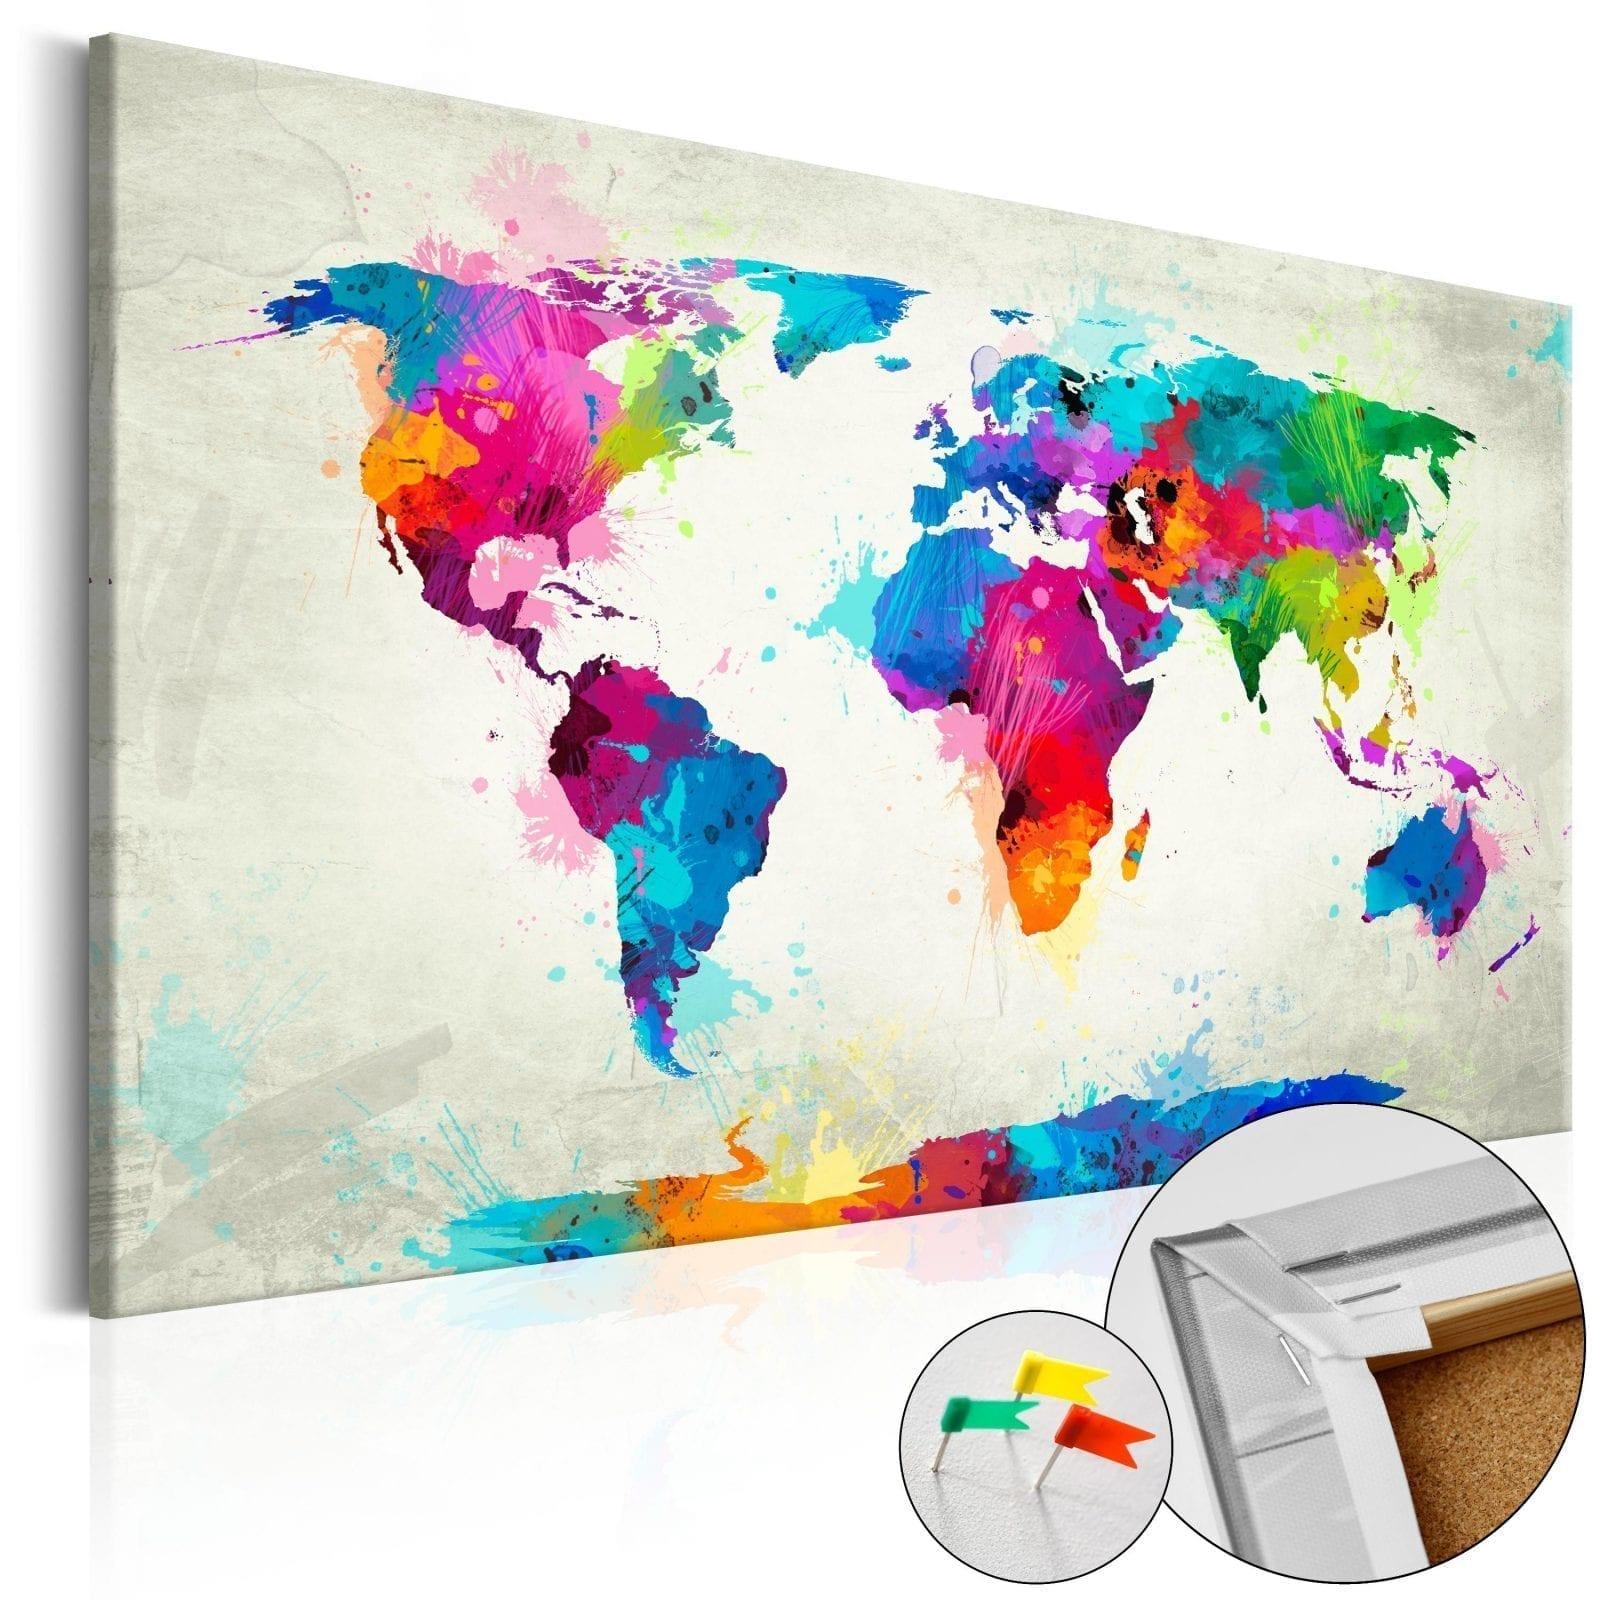 Tablero de corcho - An Explosion of Colors 1 | Potspintura.com